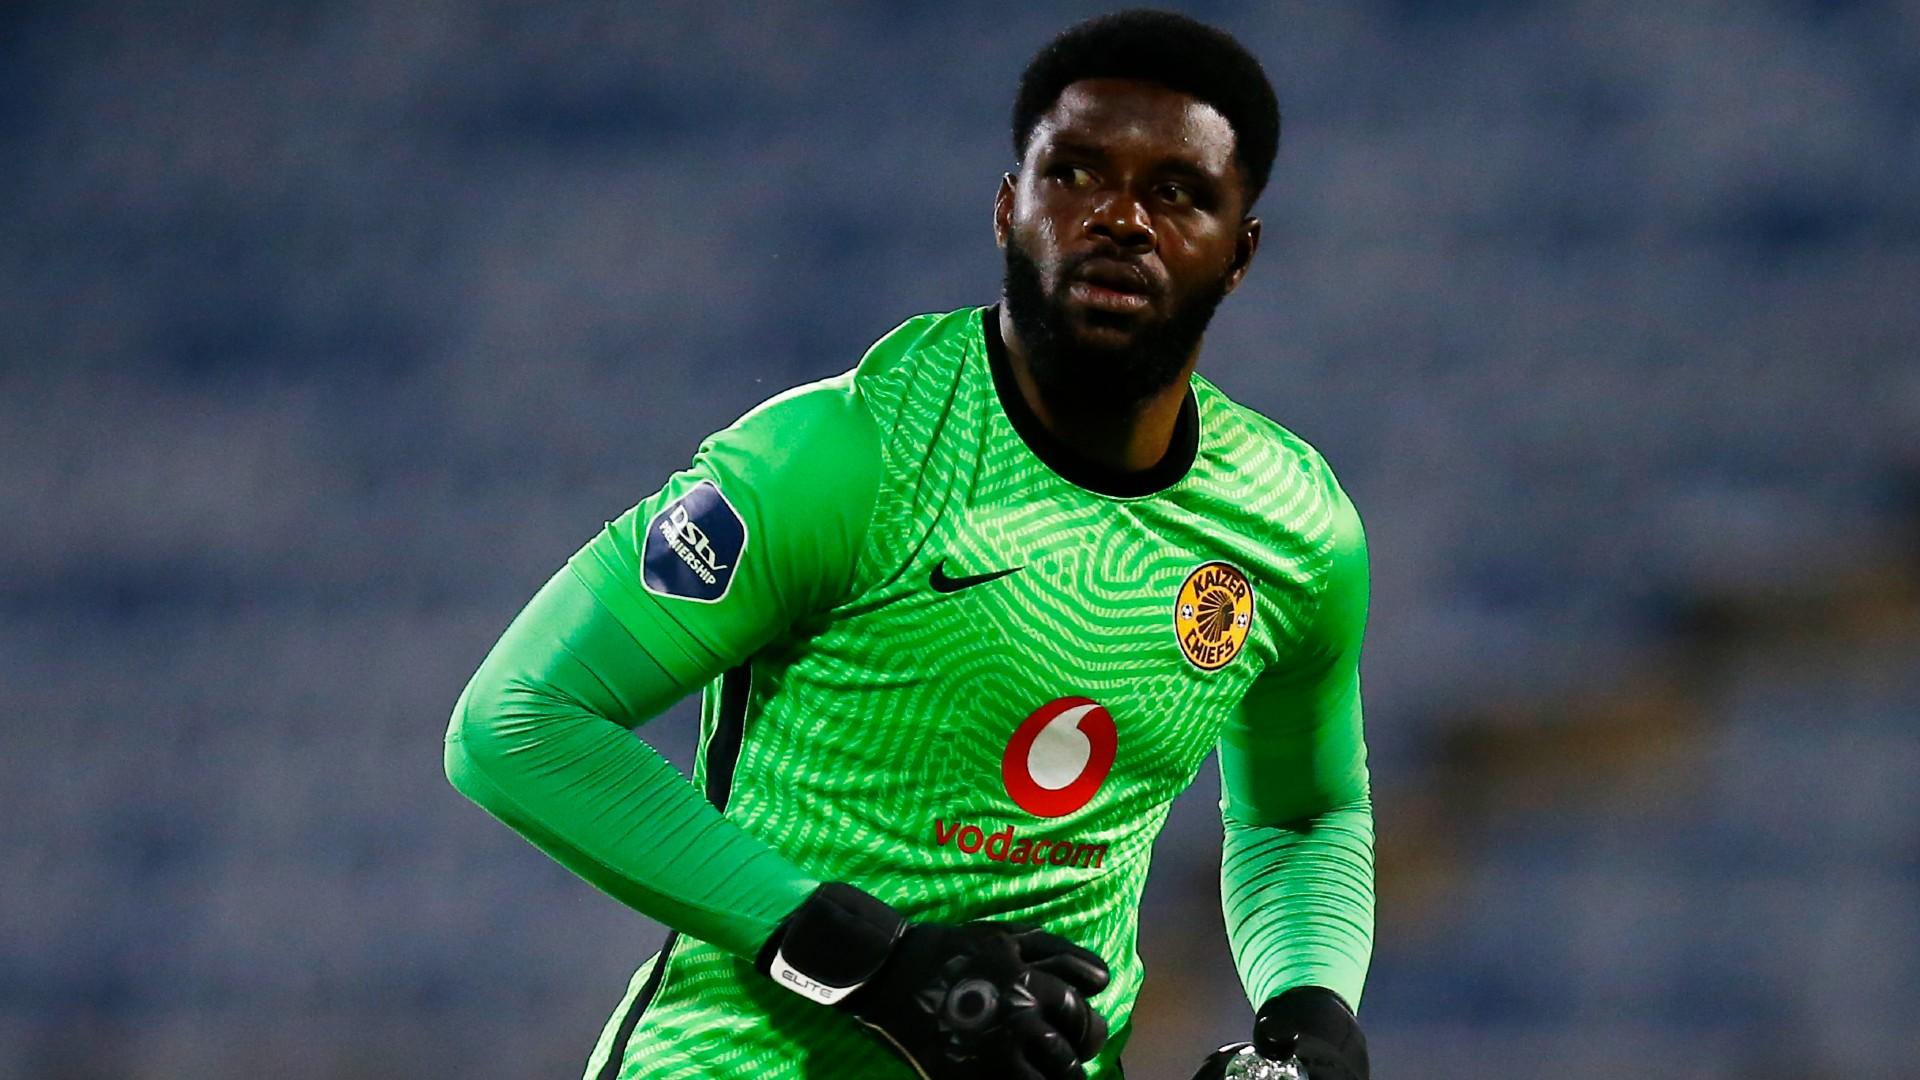 Kaizer Chiefs goalkeeper Akpeyi breaks silence after Champions League final defeat